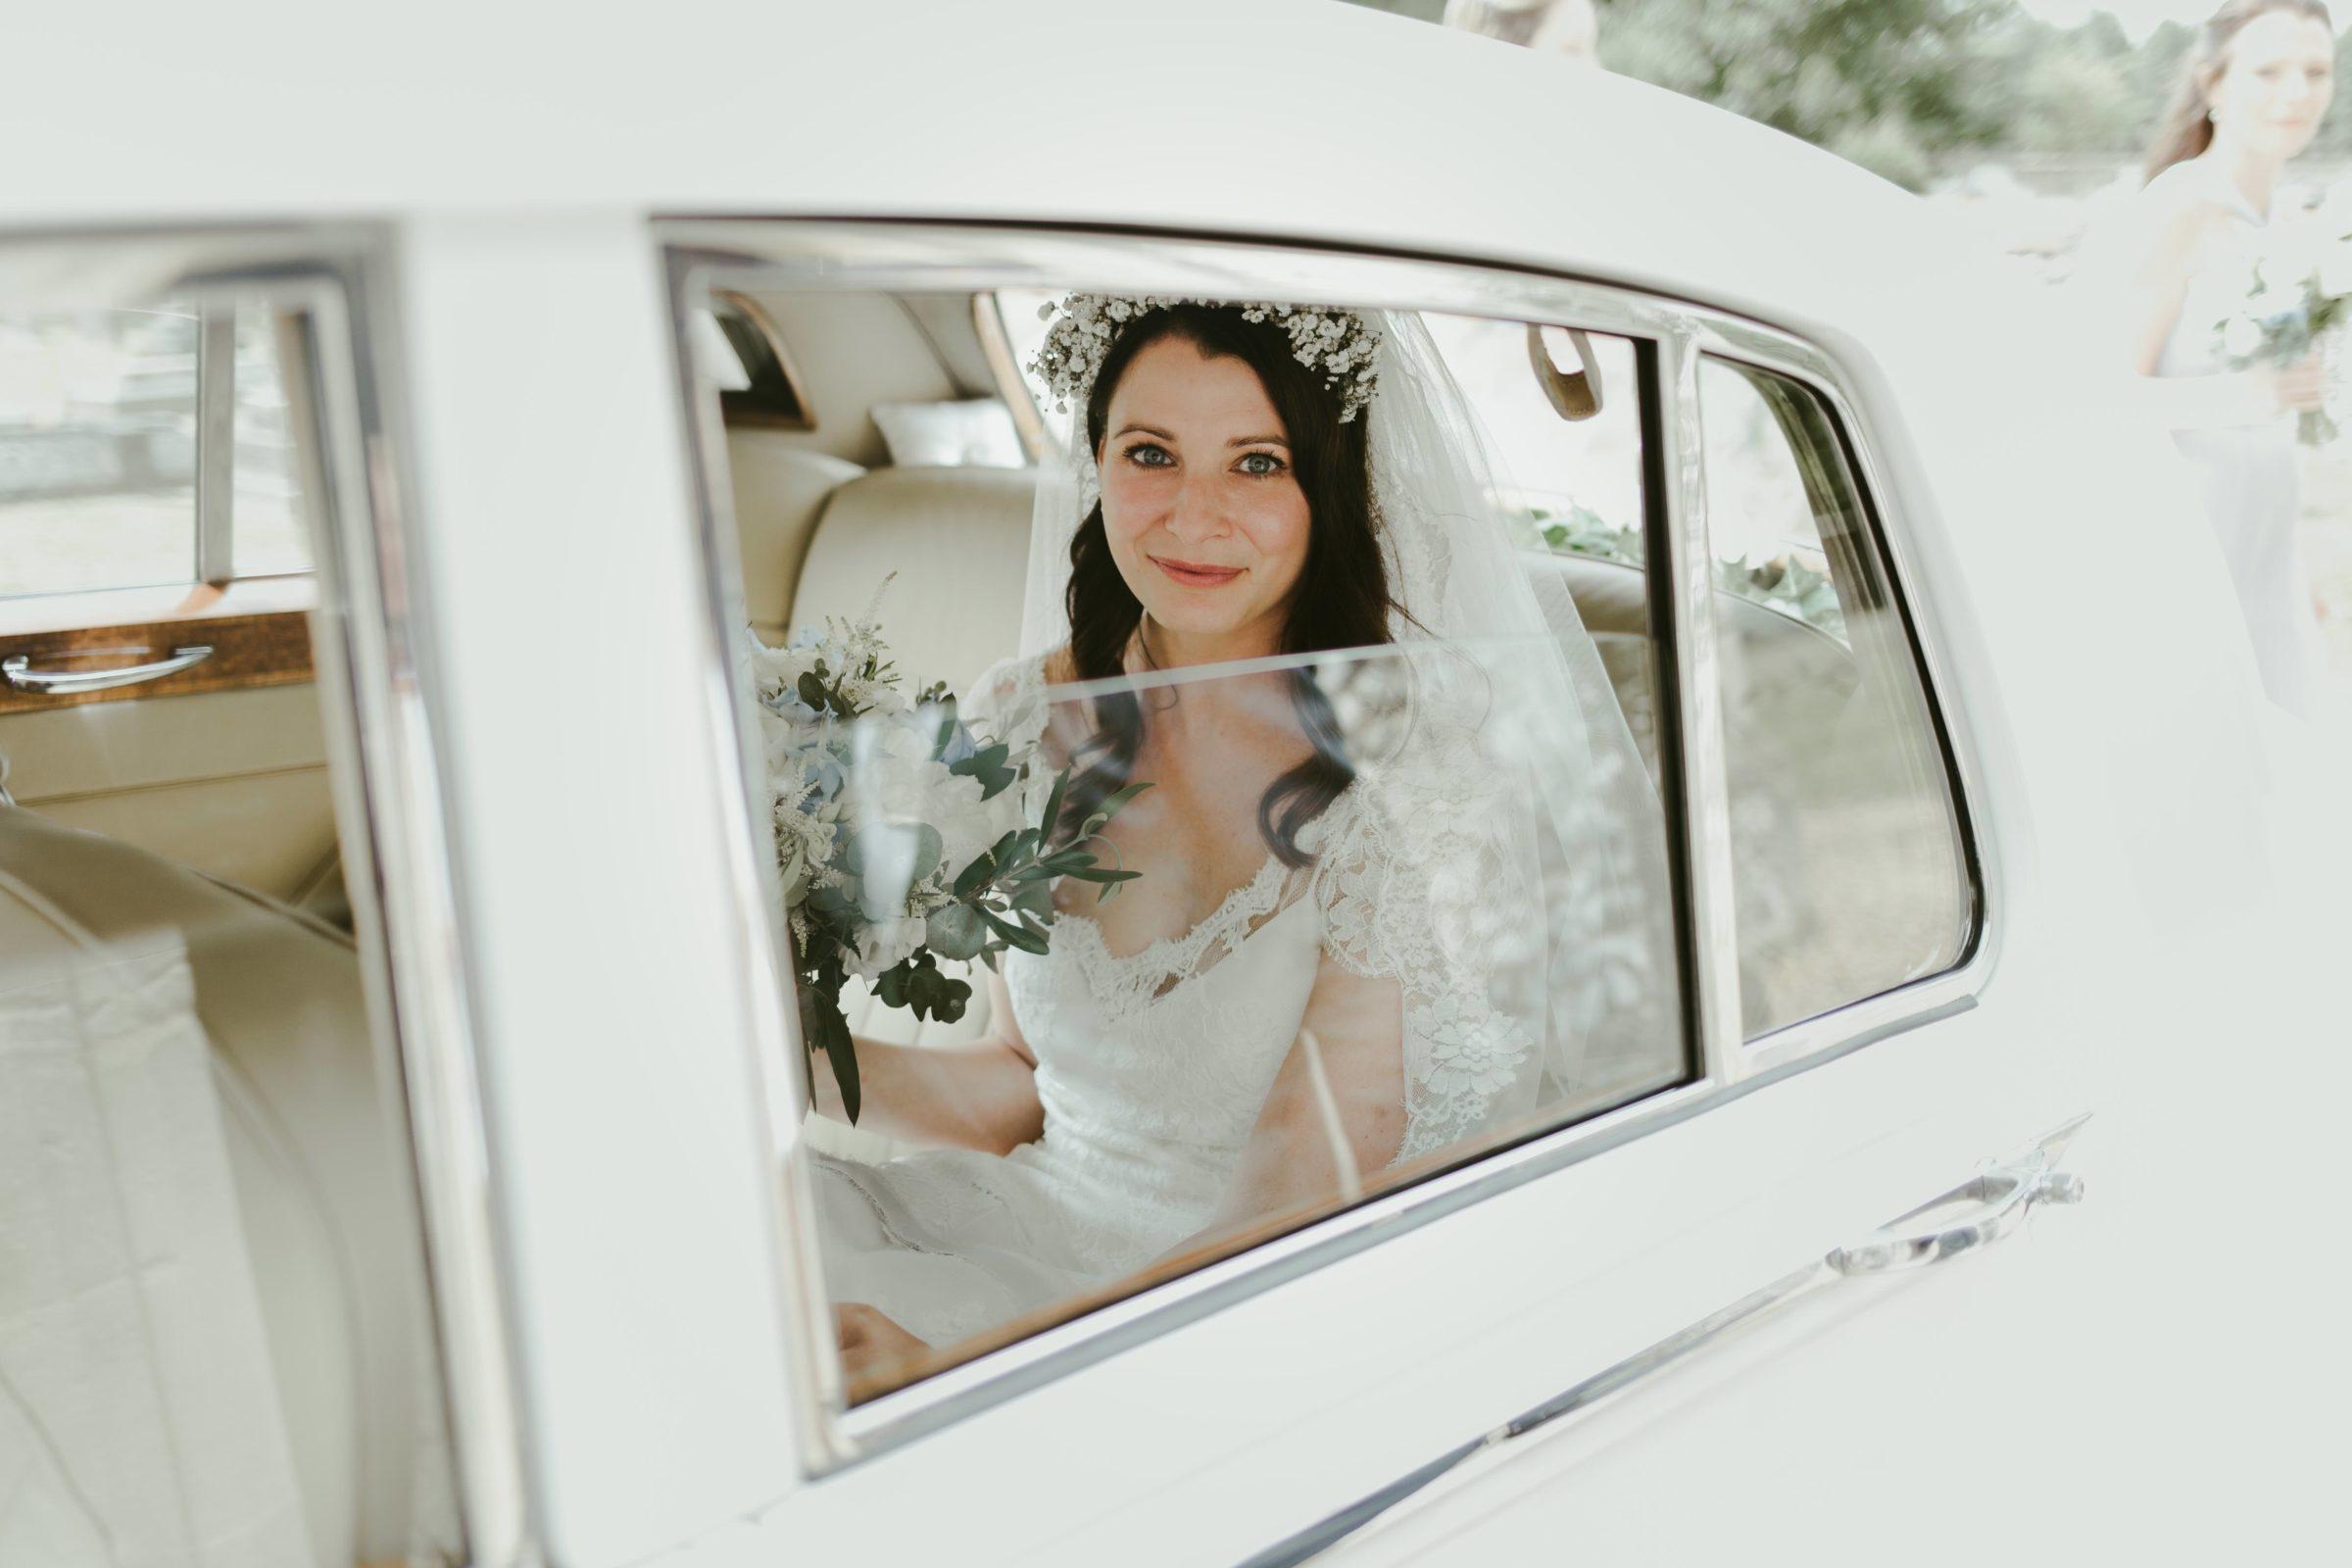 church-wedding-wedding-photography-photographer-surrey-uk-ramster-hall-venue-south-east-bride